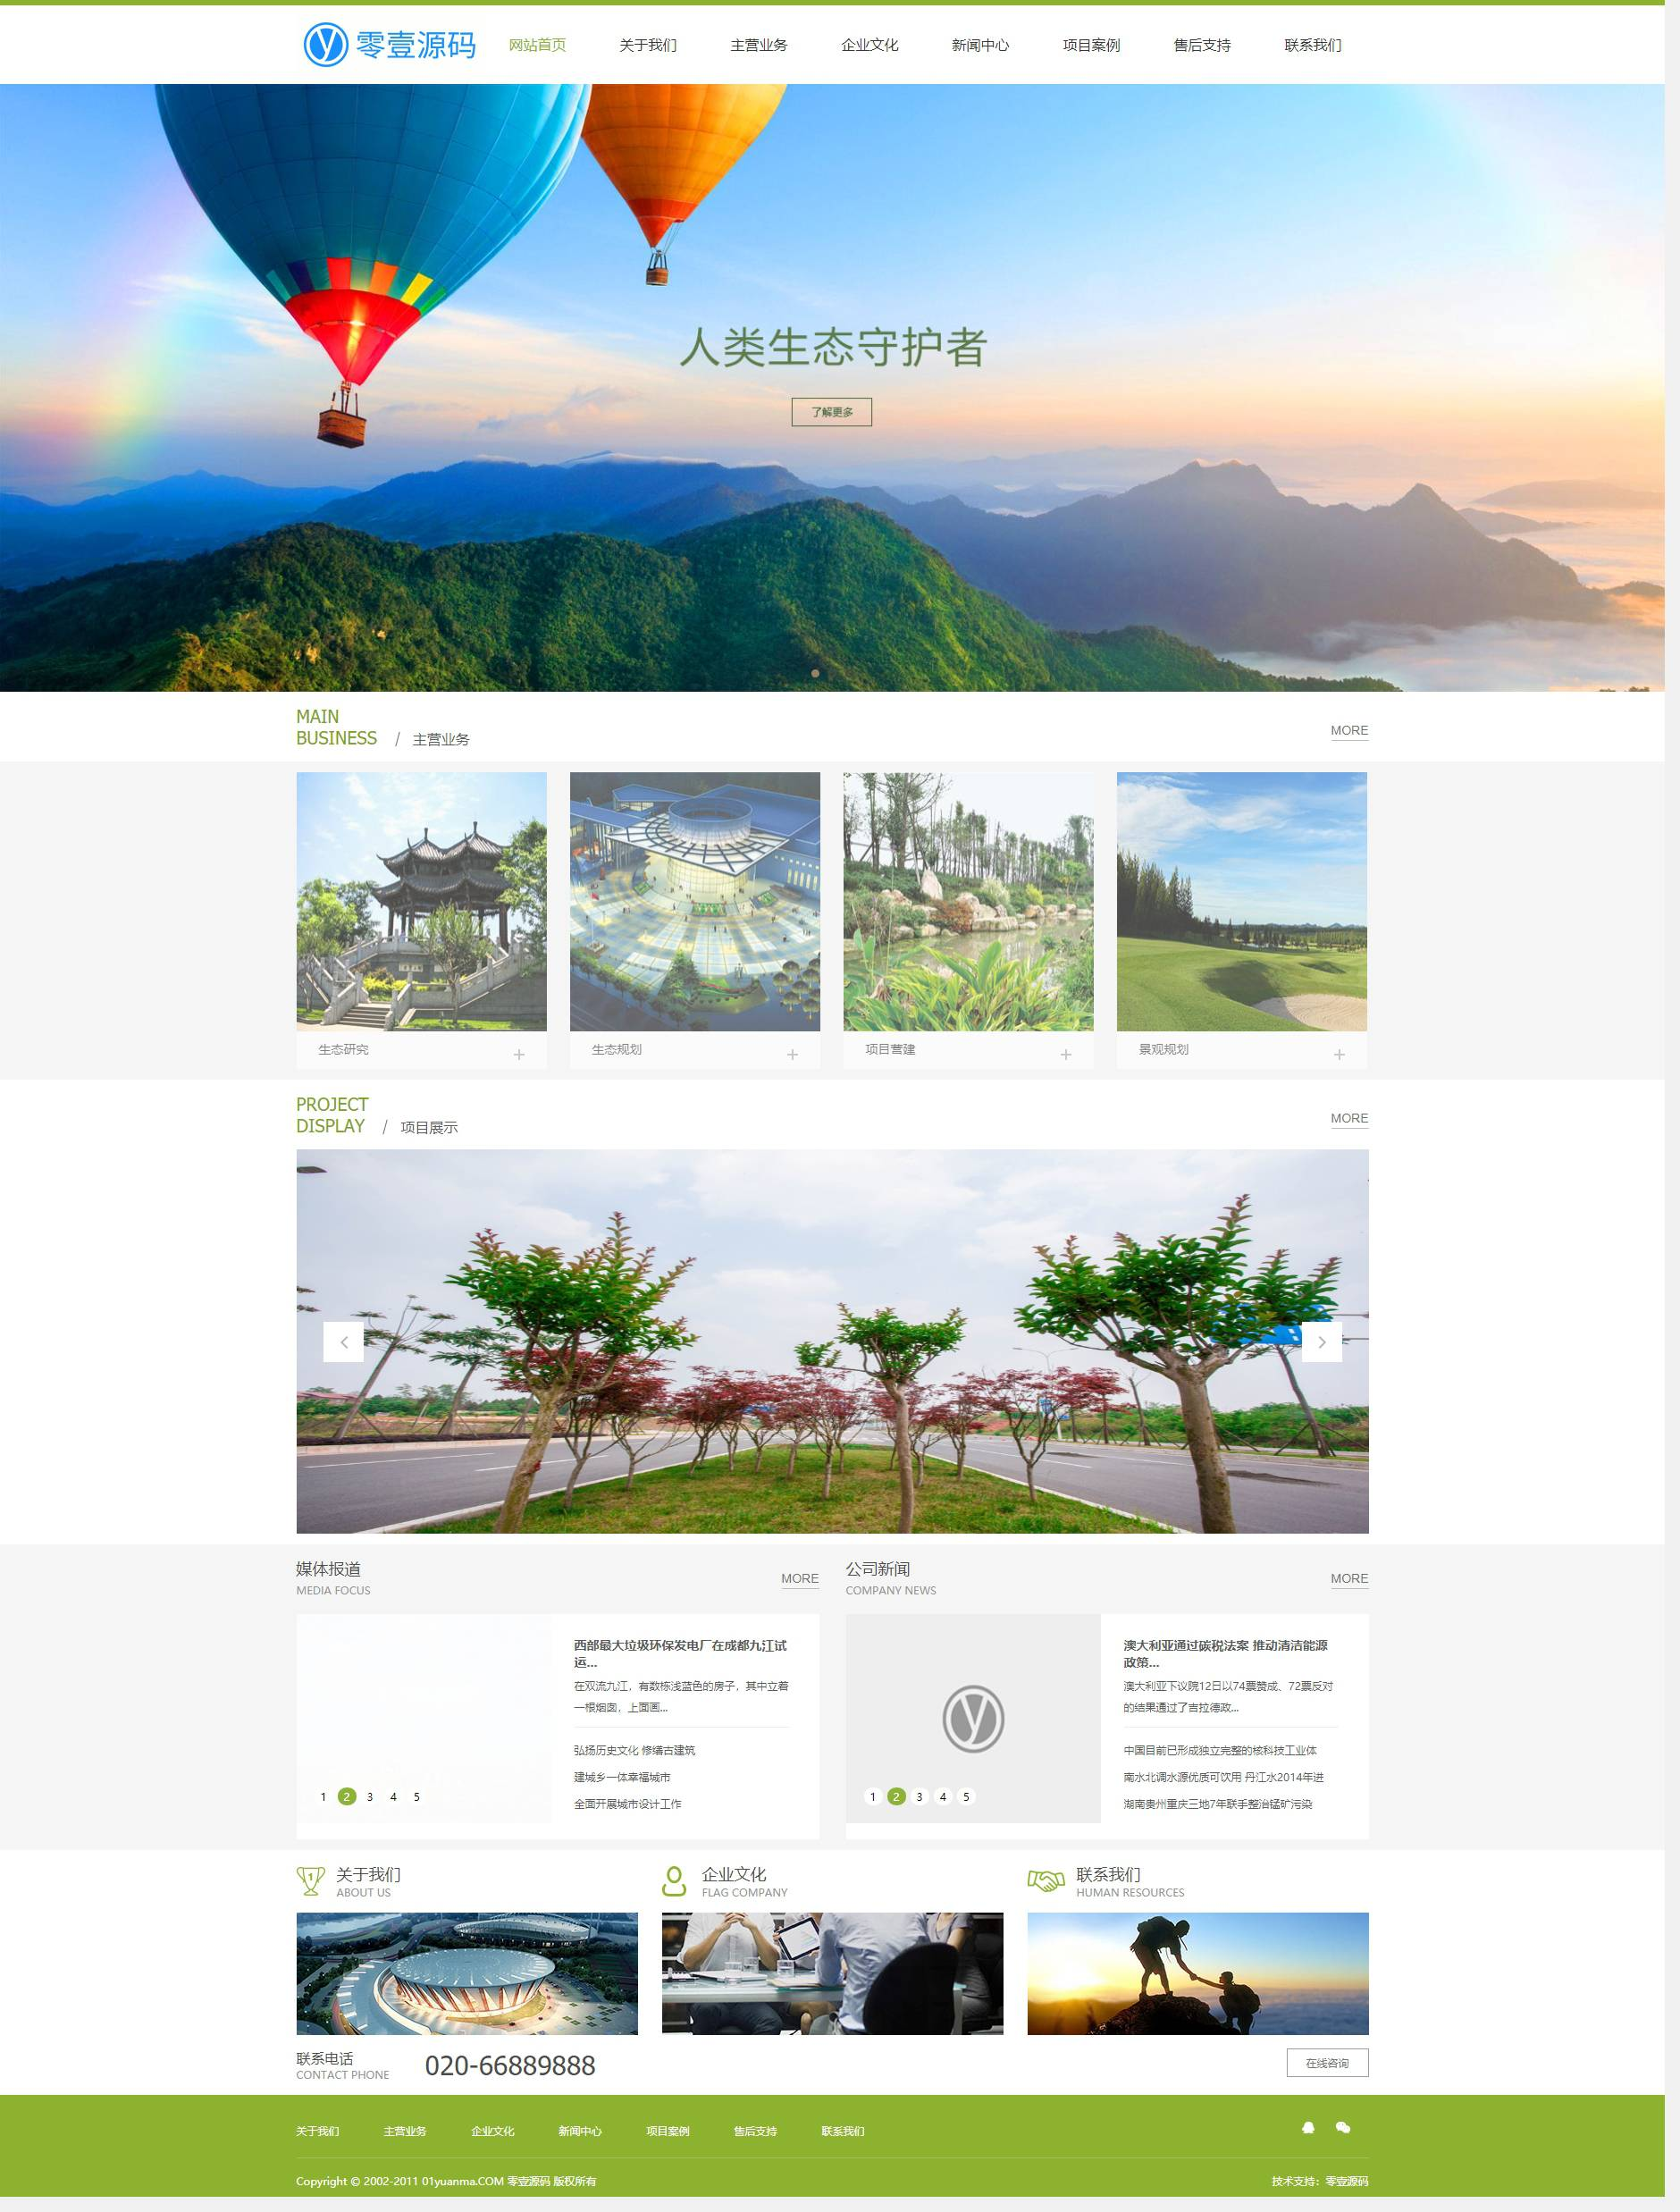 dedecms生态园林类企业公司网站织梦模板